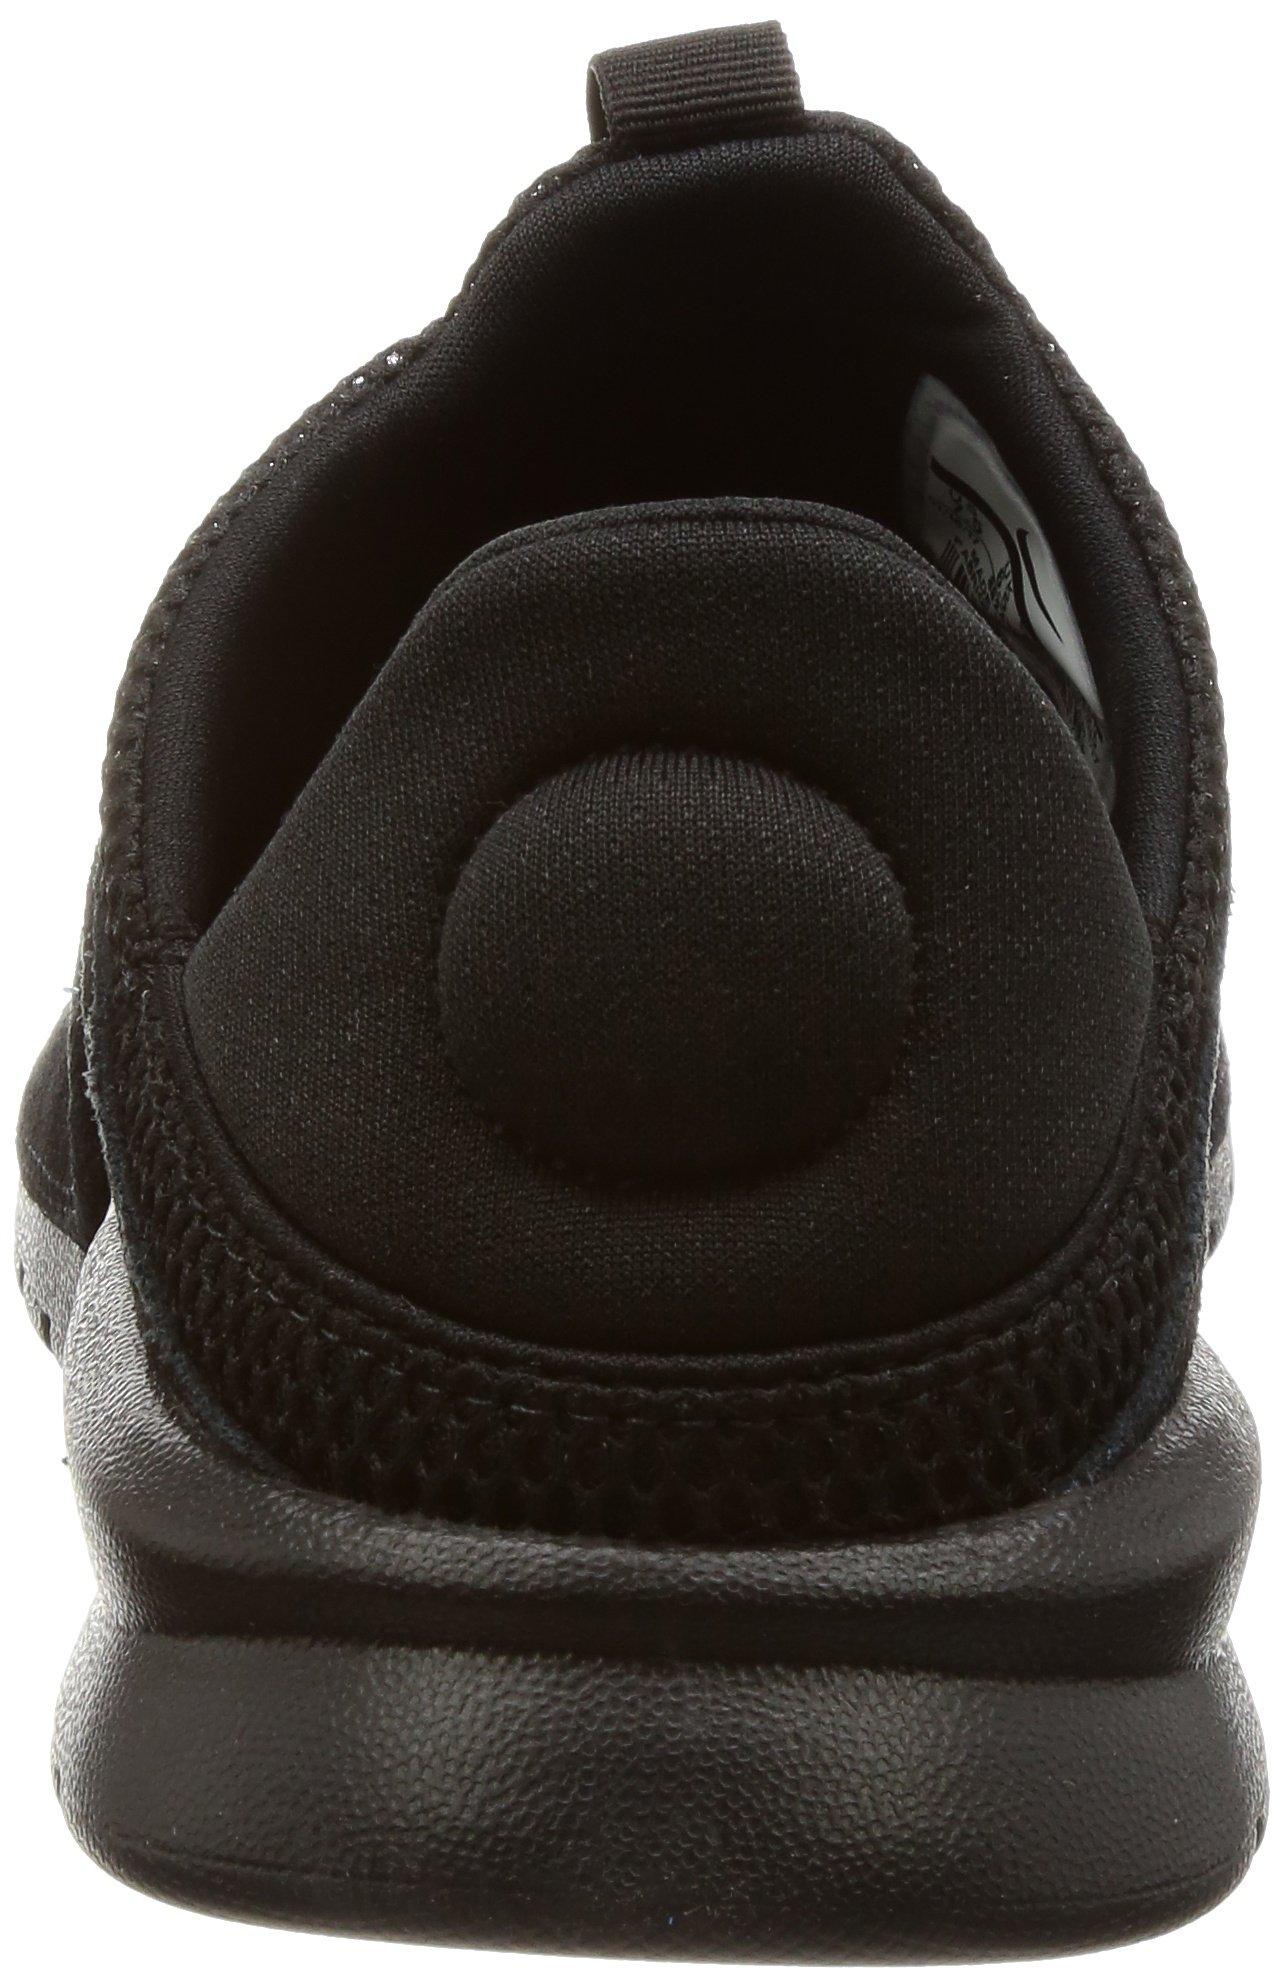 Nike BENASSI SLP Mens fashion-sneakers 882410-003_9.5 - BLACK/BLACK-BLACK by NIKE (Image #2)